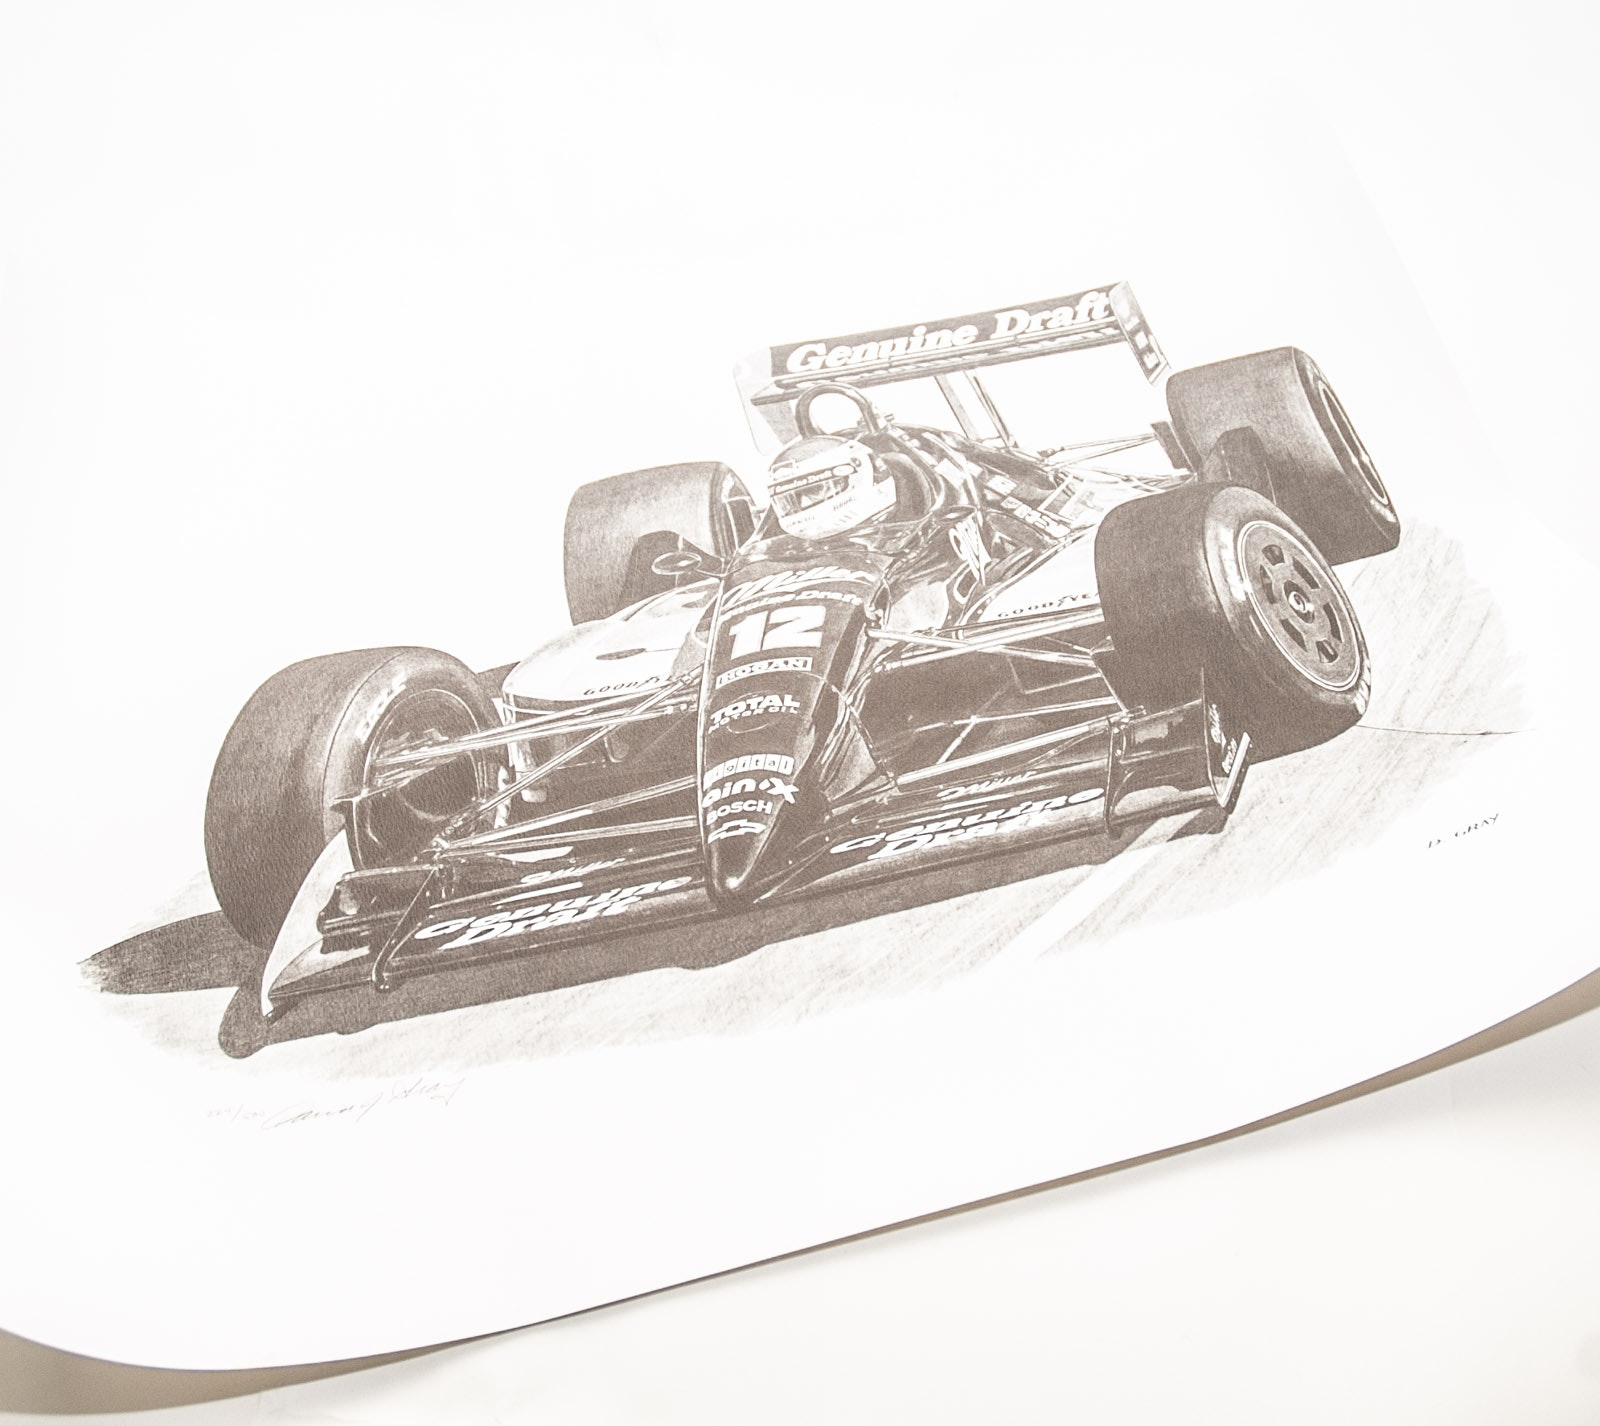 Signed David J. Gray Limited Edition Racing Print